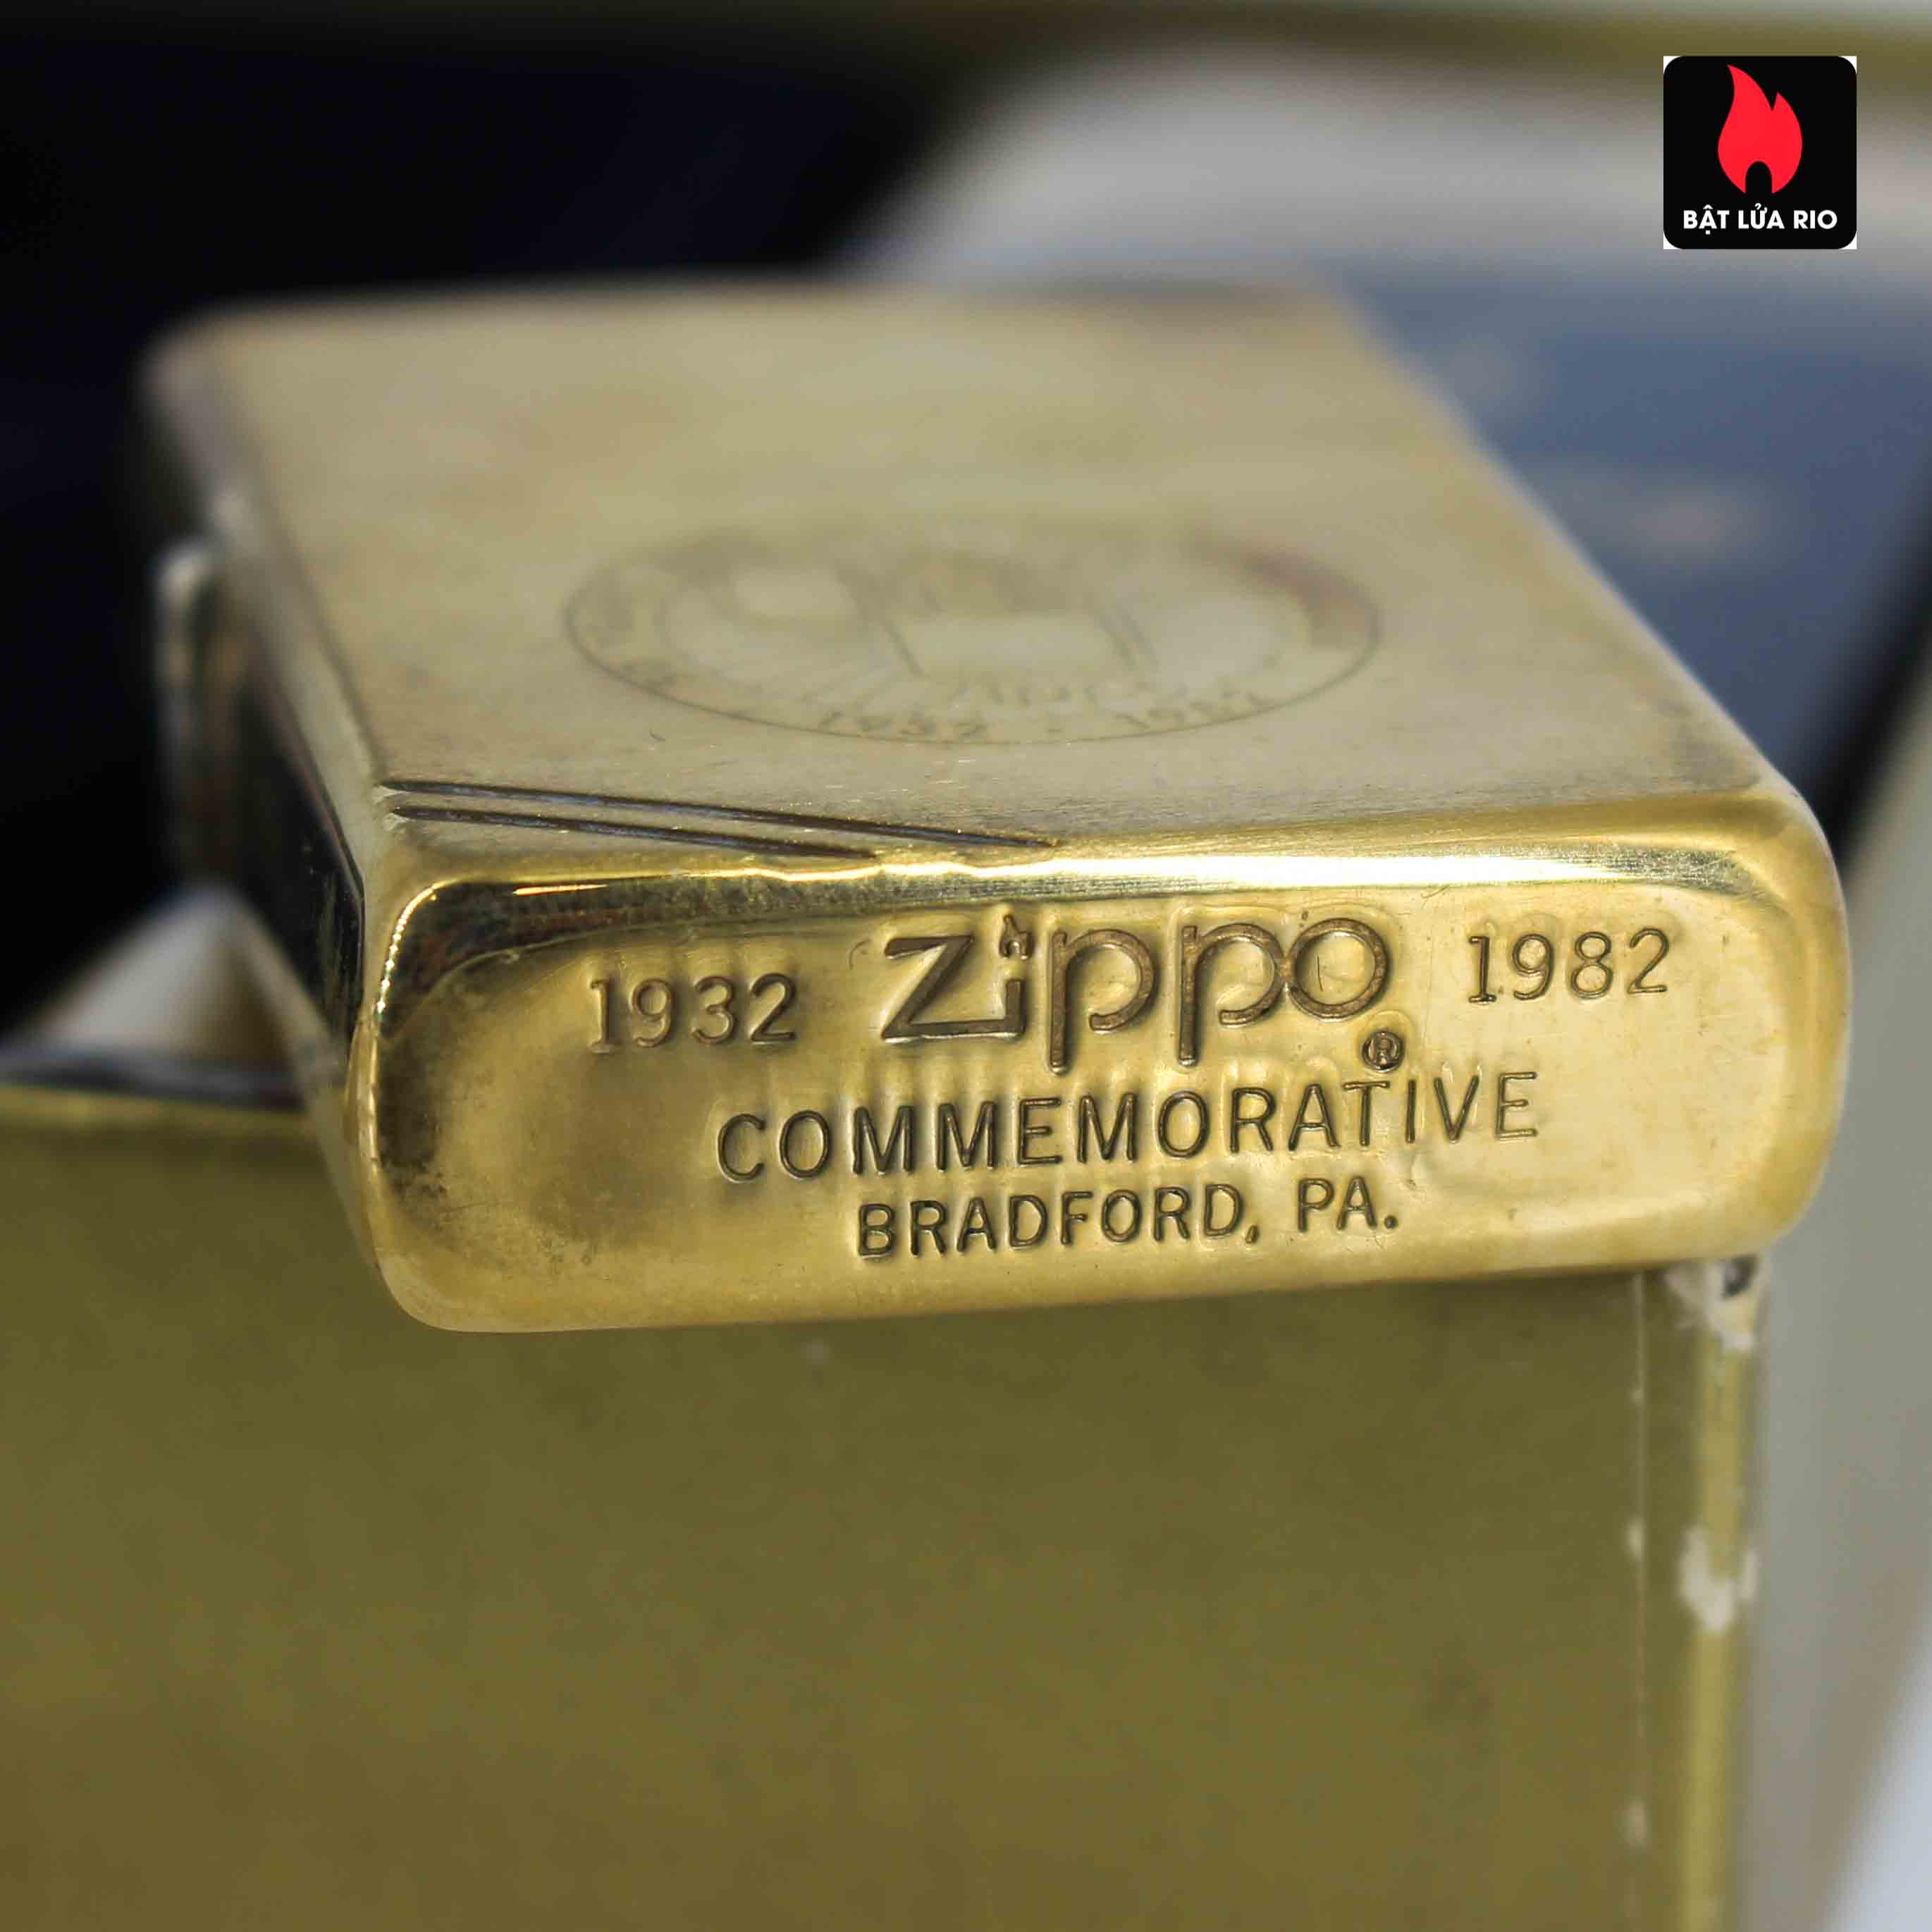 Zippo Chu Niên 1932 - 1982 - 50th Anniversary - Employee 4